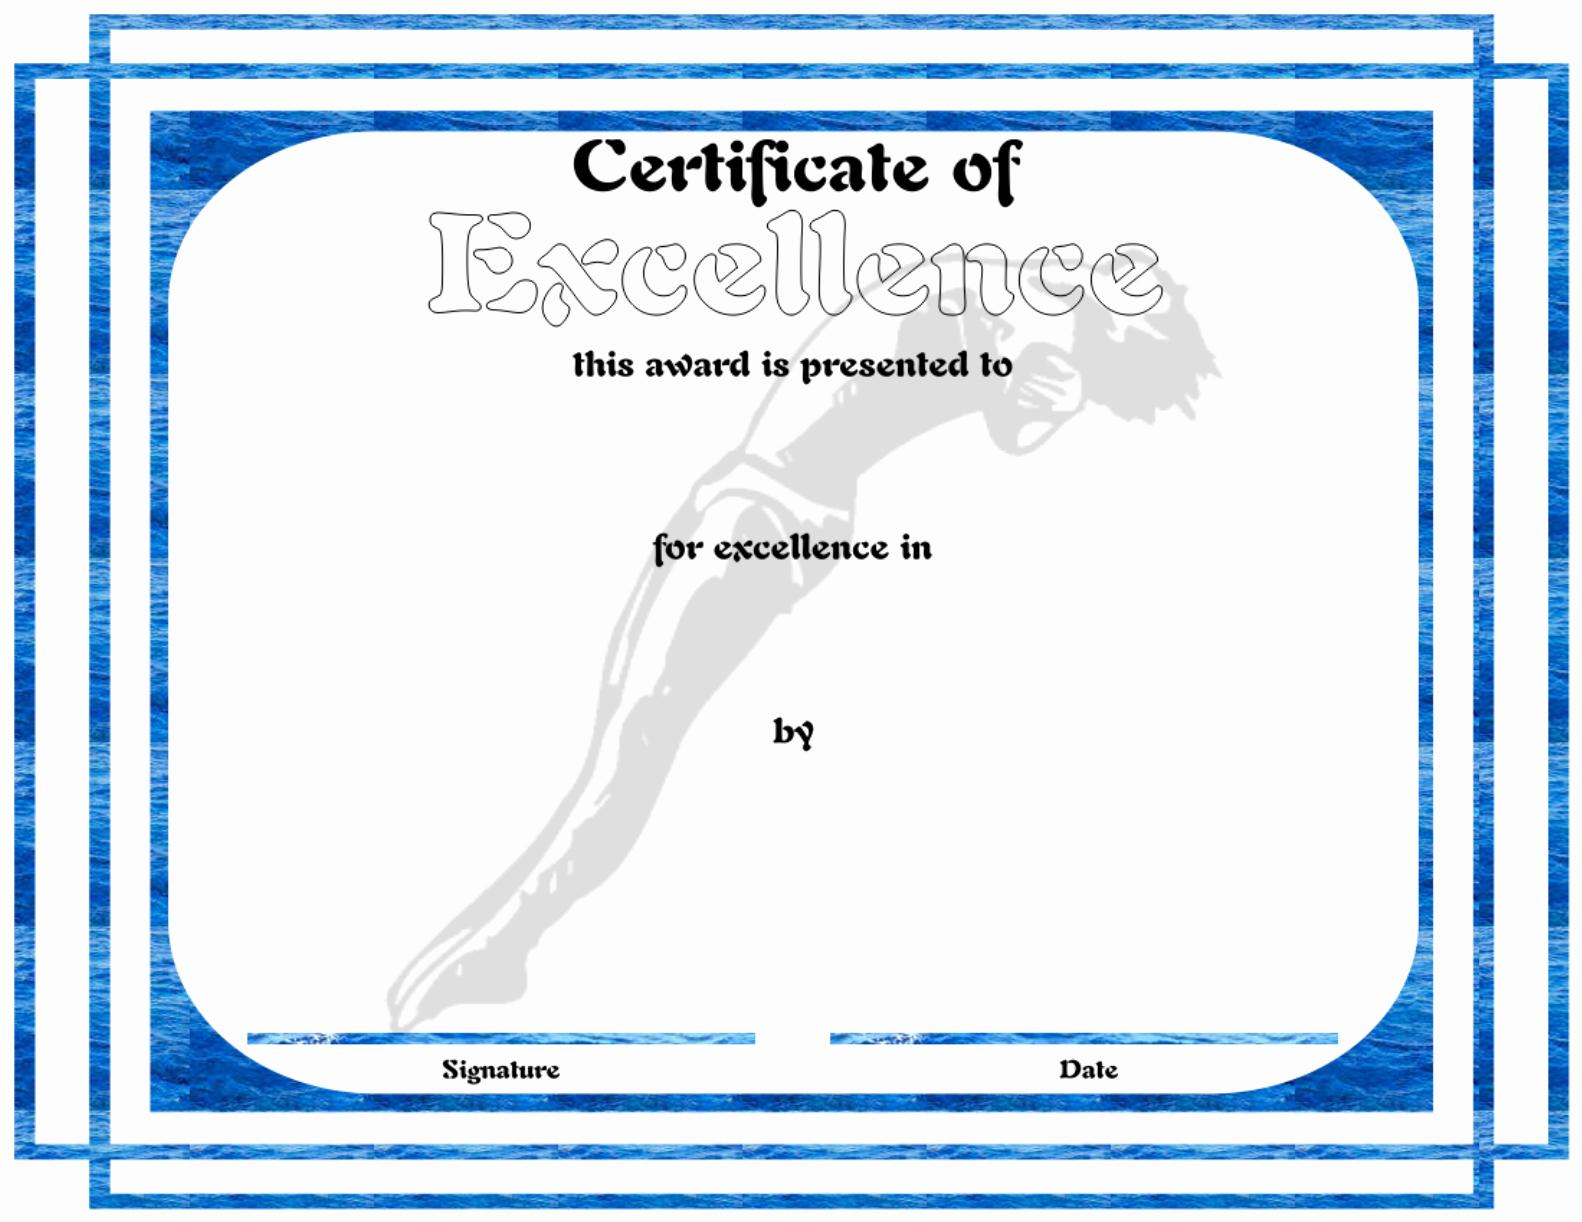 Swimming Certificate Template Free Beautiful Download Swimming Certificate Sample for Free formtemplate